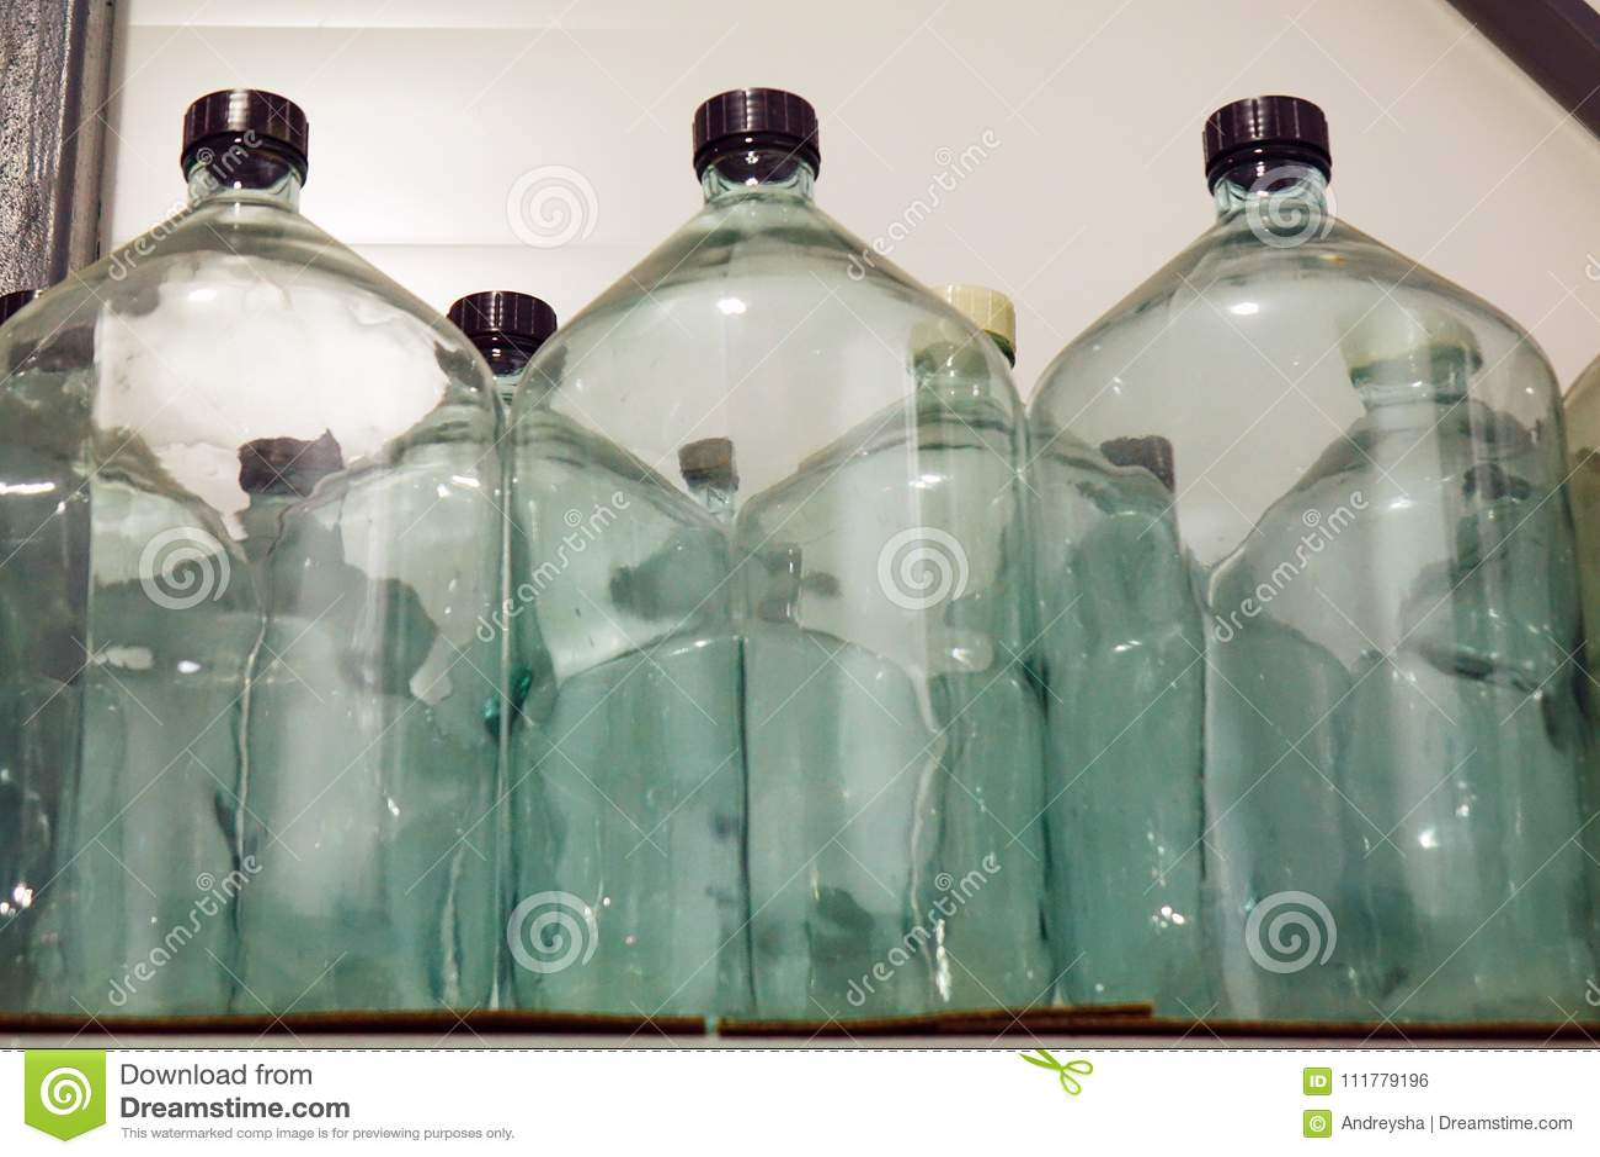 Large glass bottles. storage